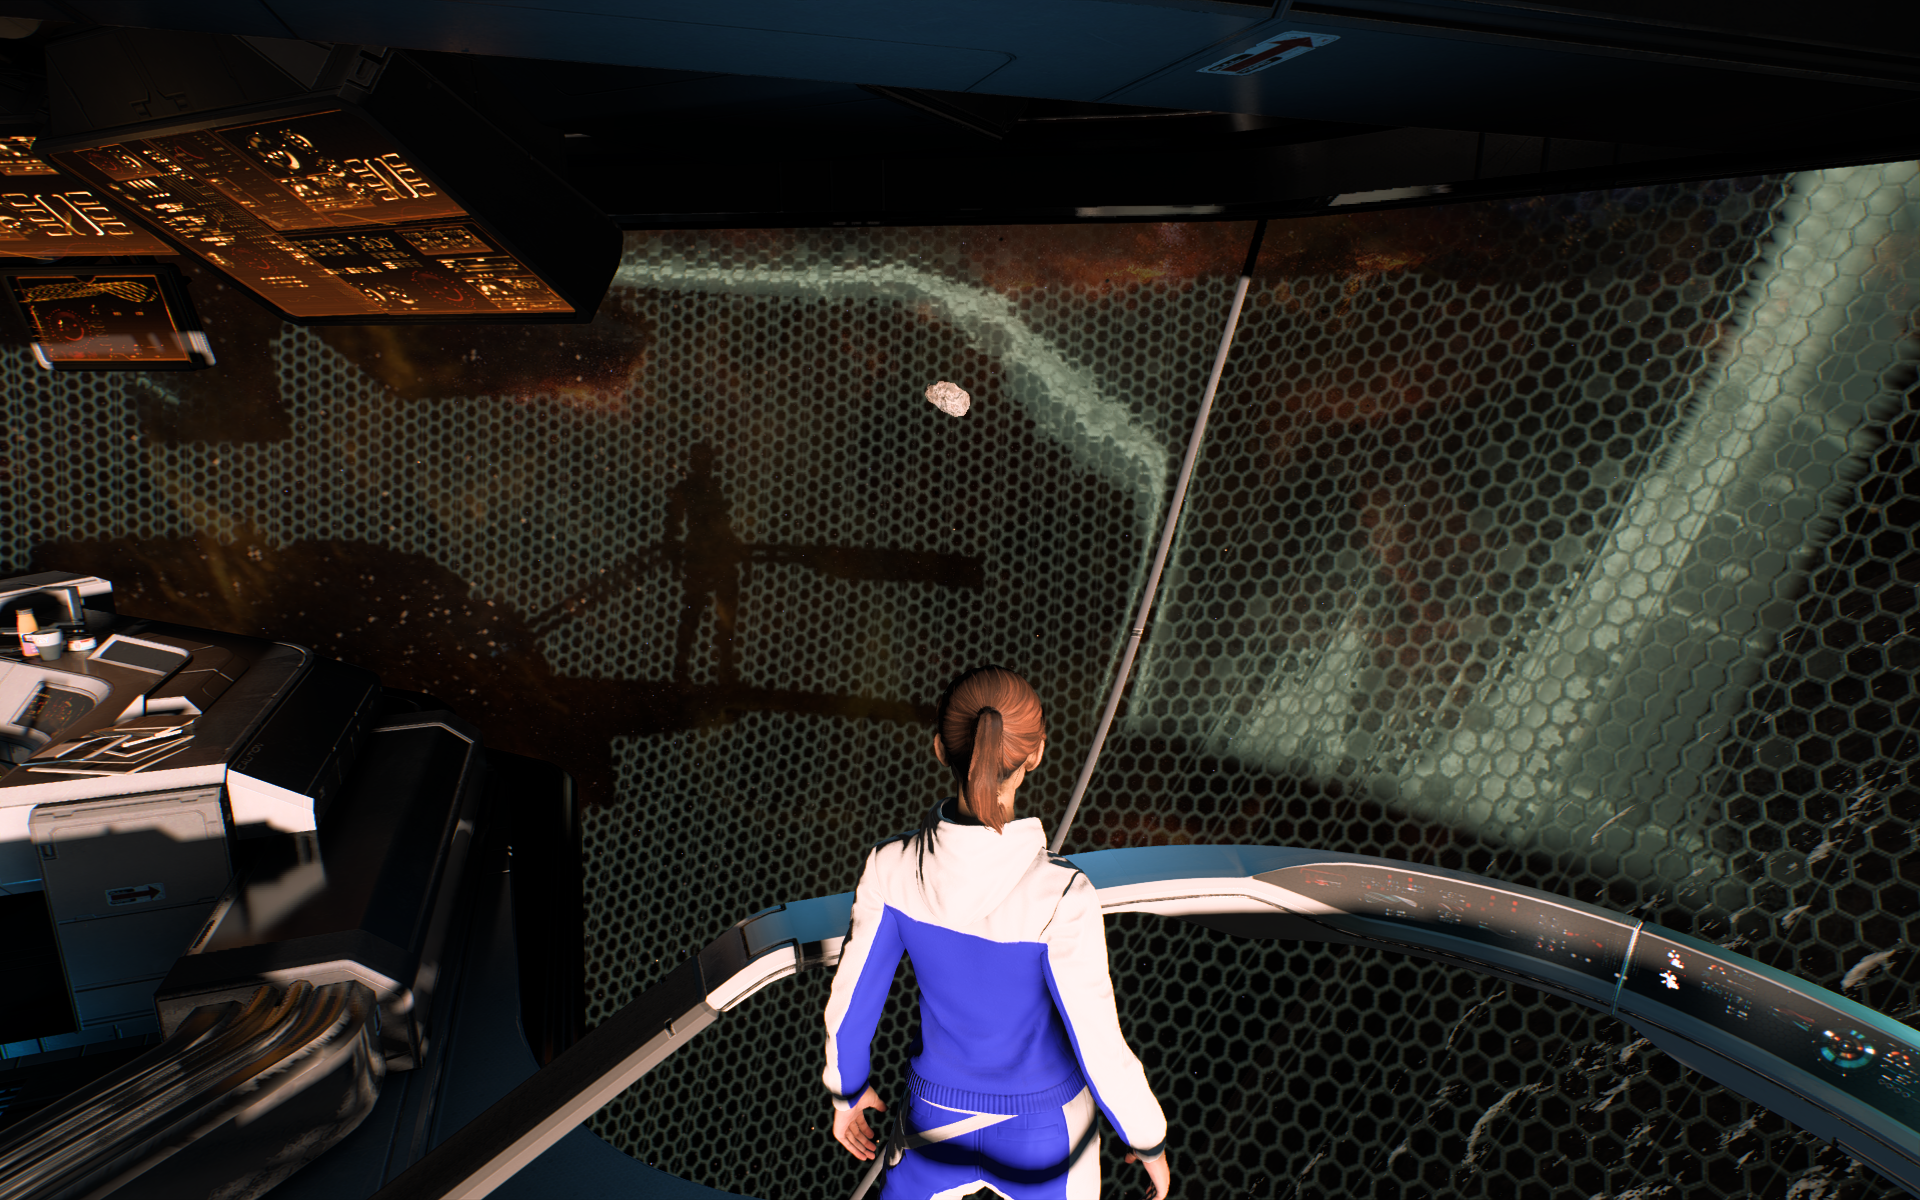 Mass Effect Andromeda Screenshot  - 13.03.08.55.png - Mass Effect: Andromeda